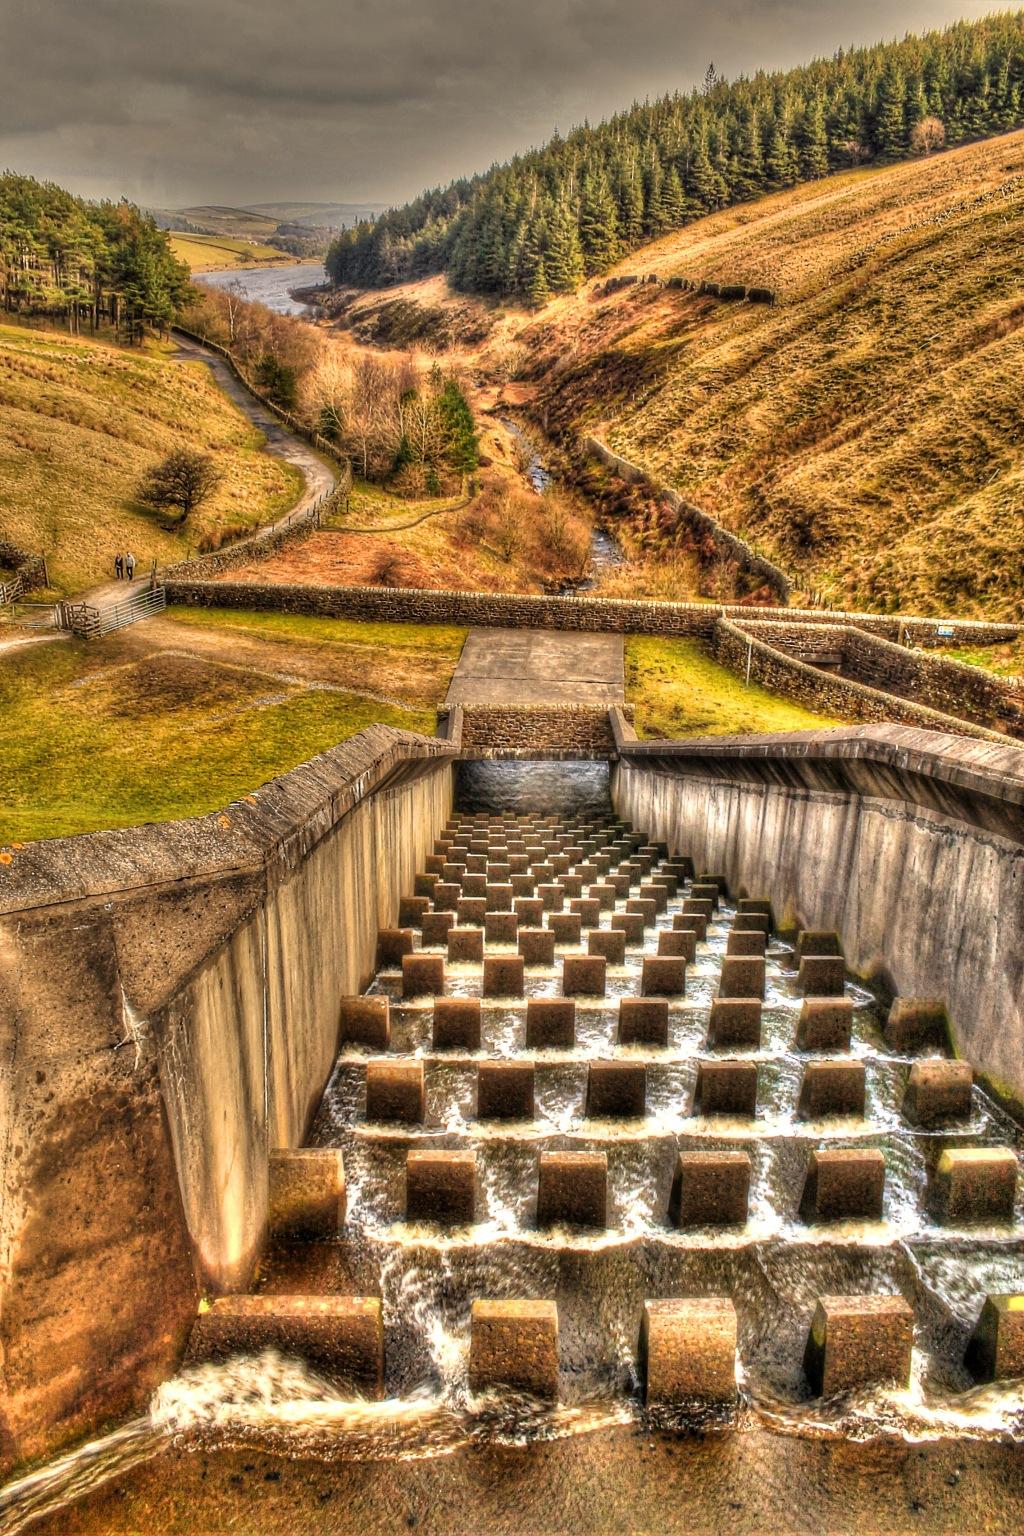 ogden reservoirs from top